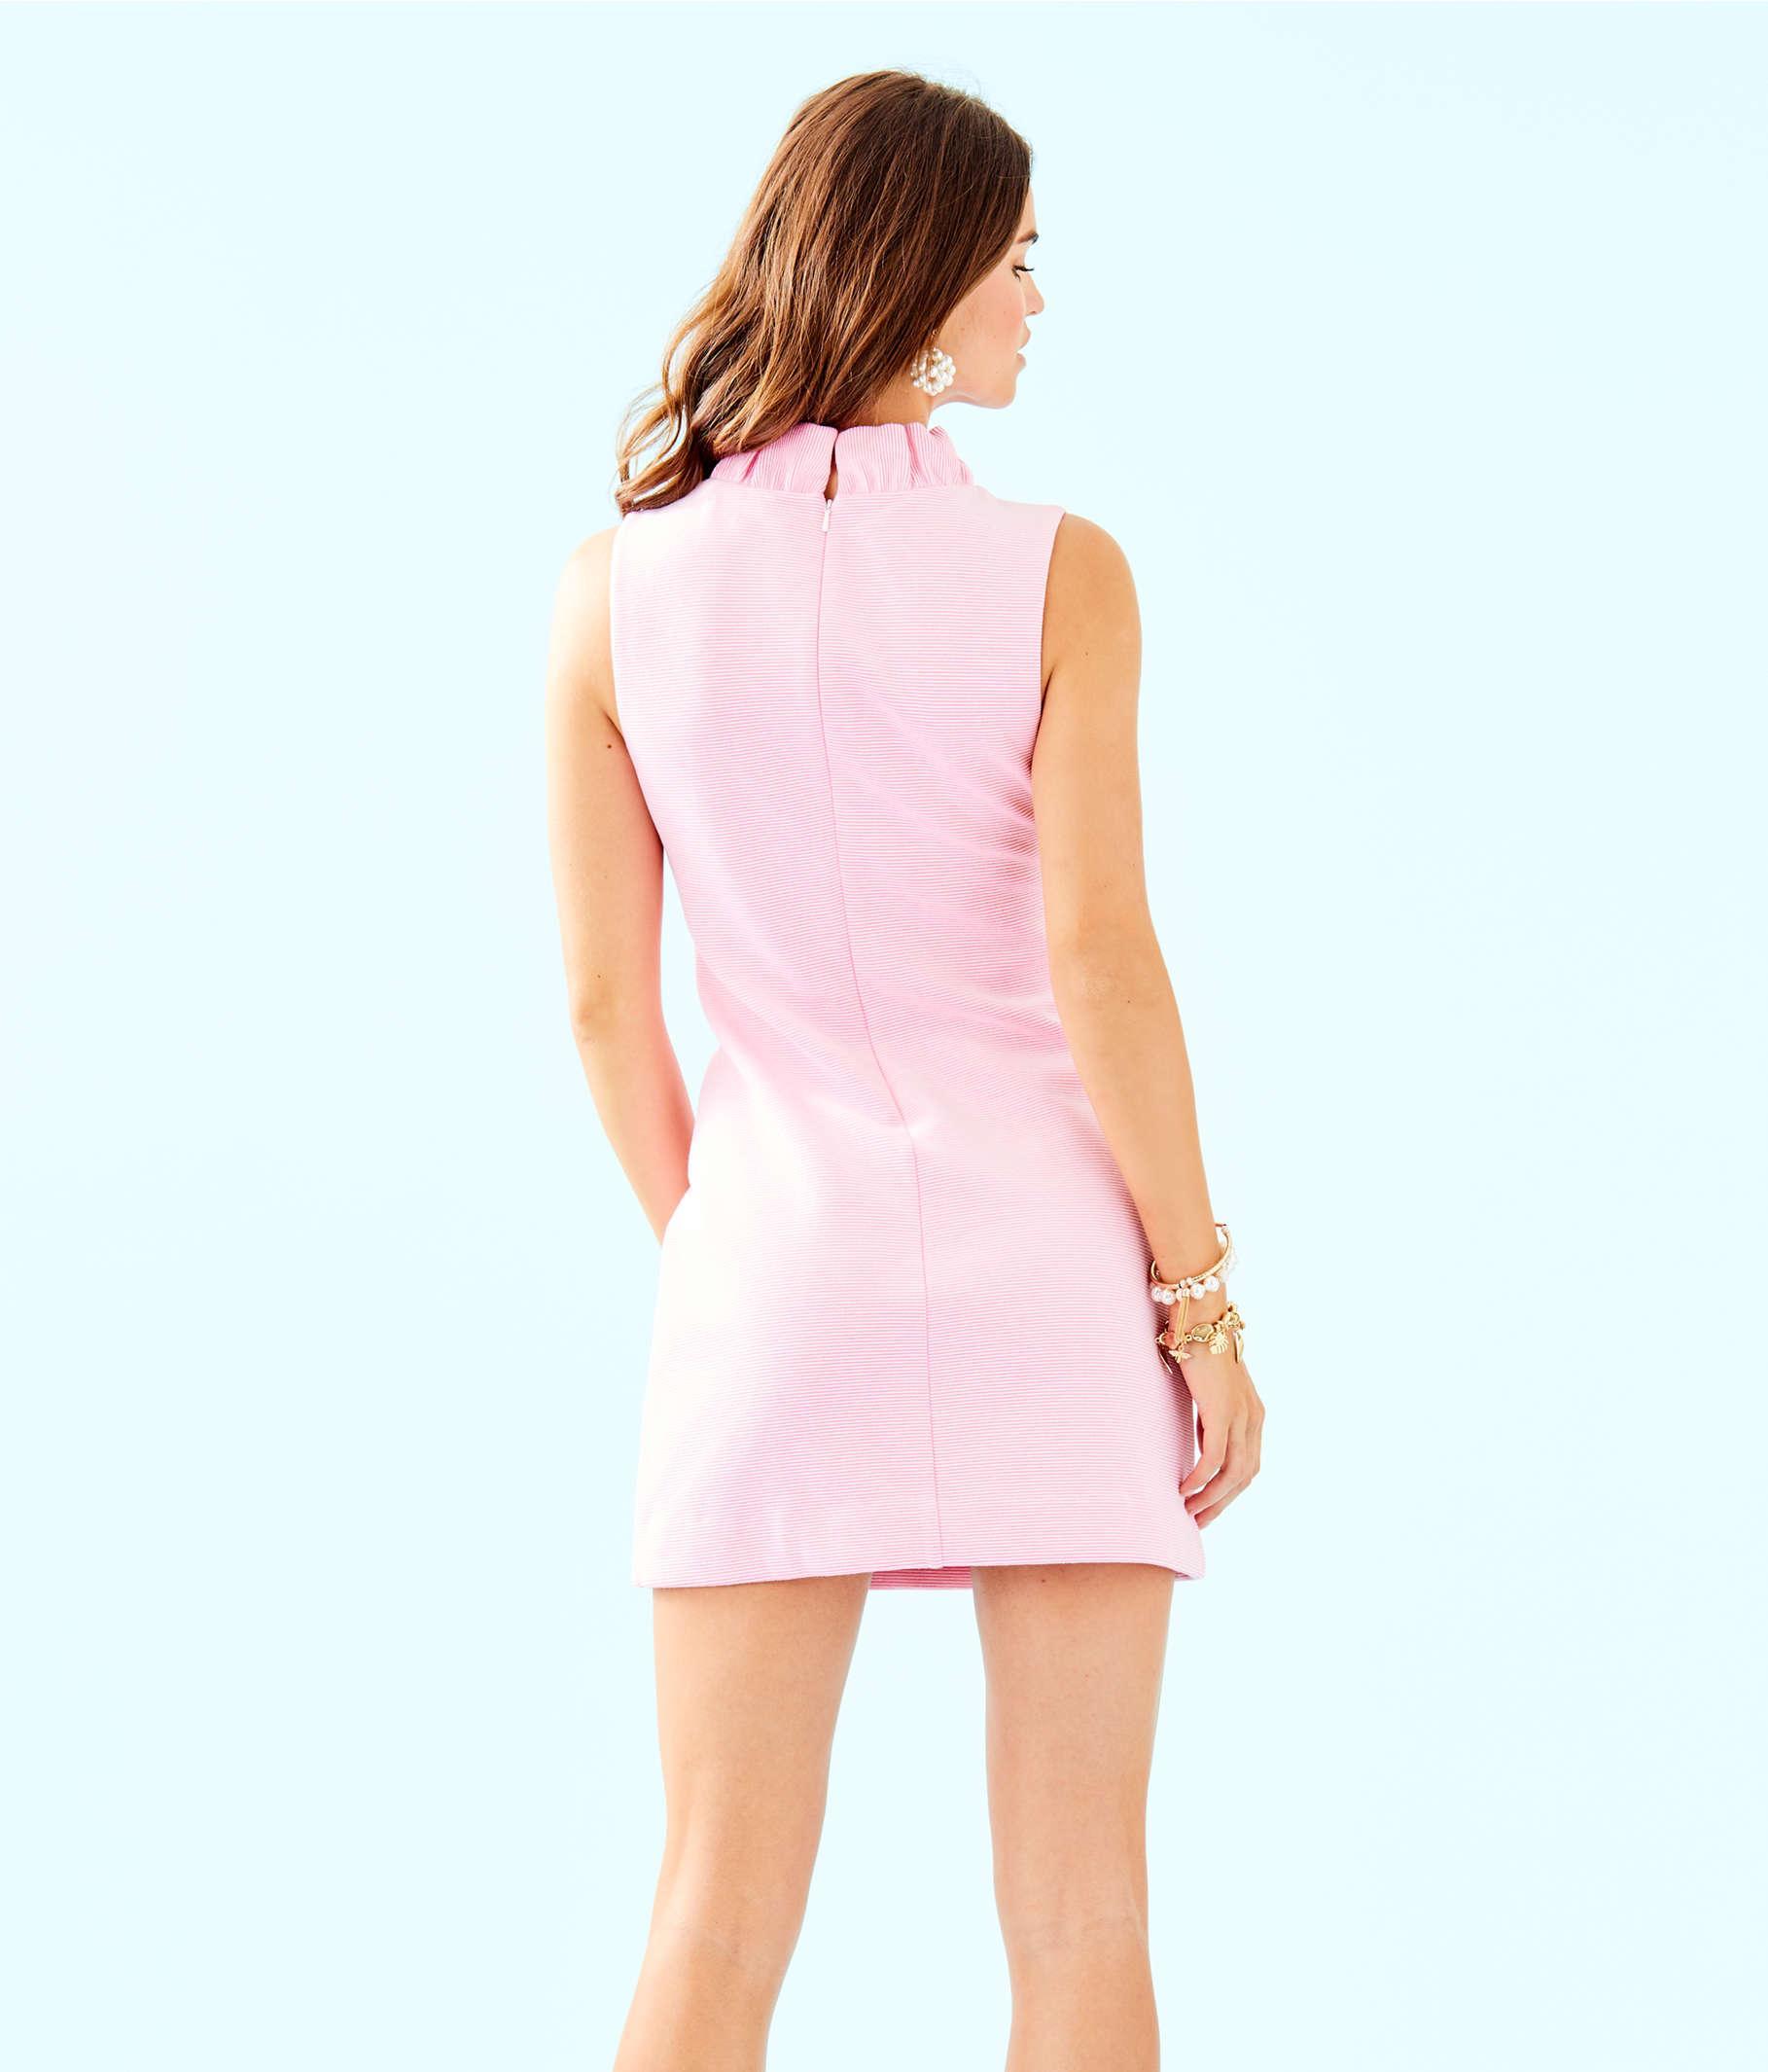 2019 Lilly Pulitzer Tisbury Shift Dress Size XL Pink Stripe